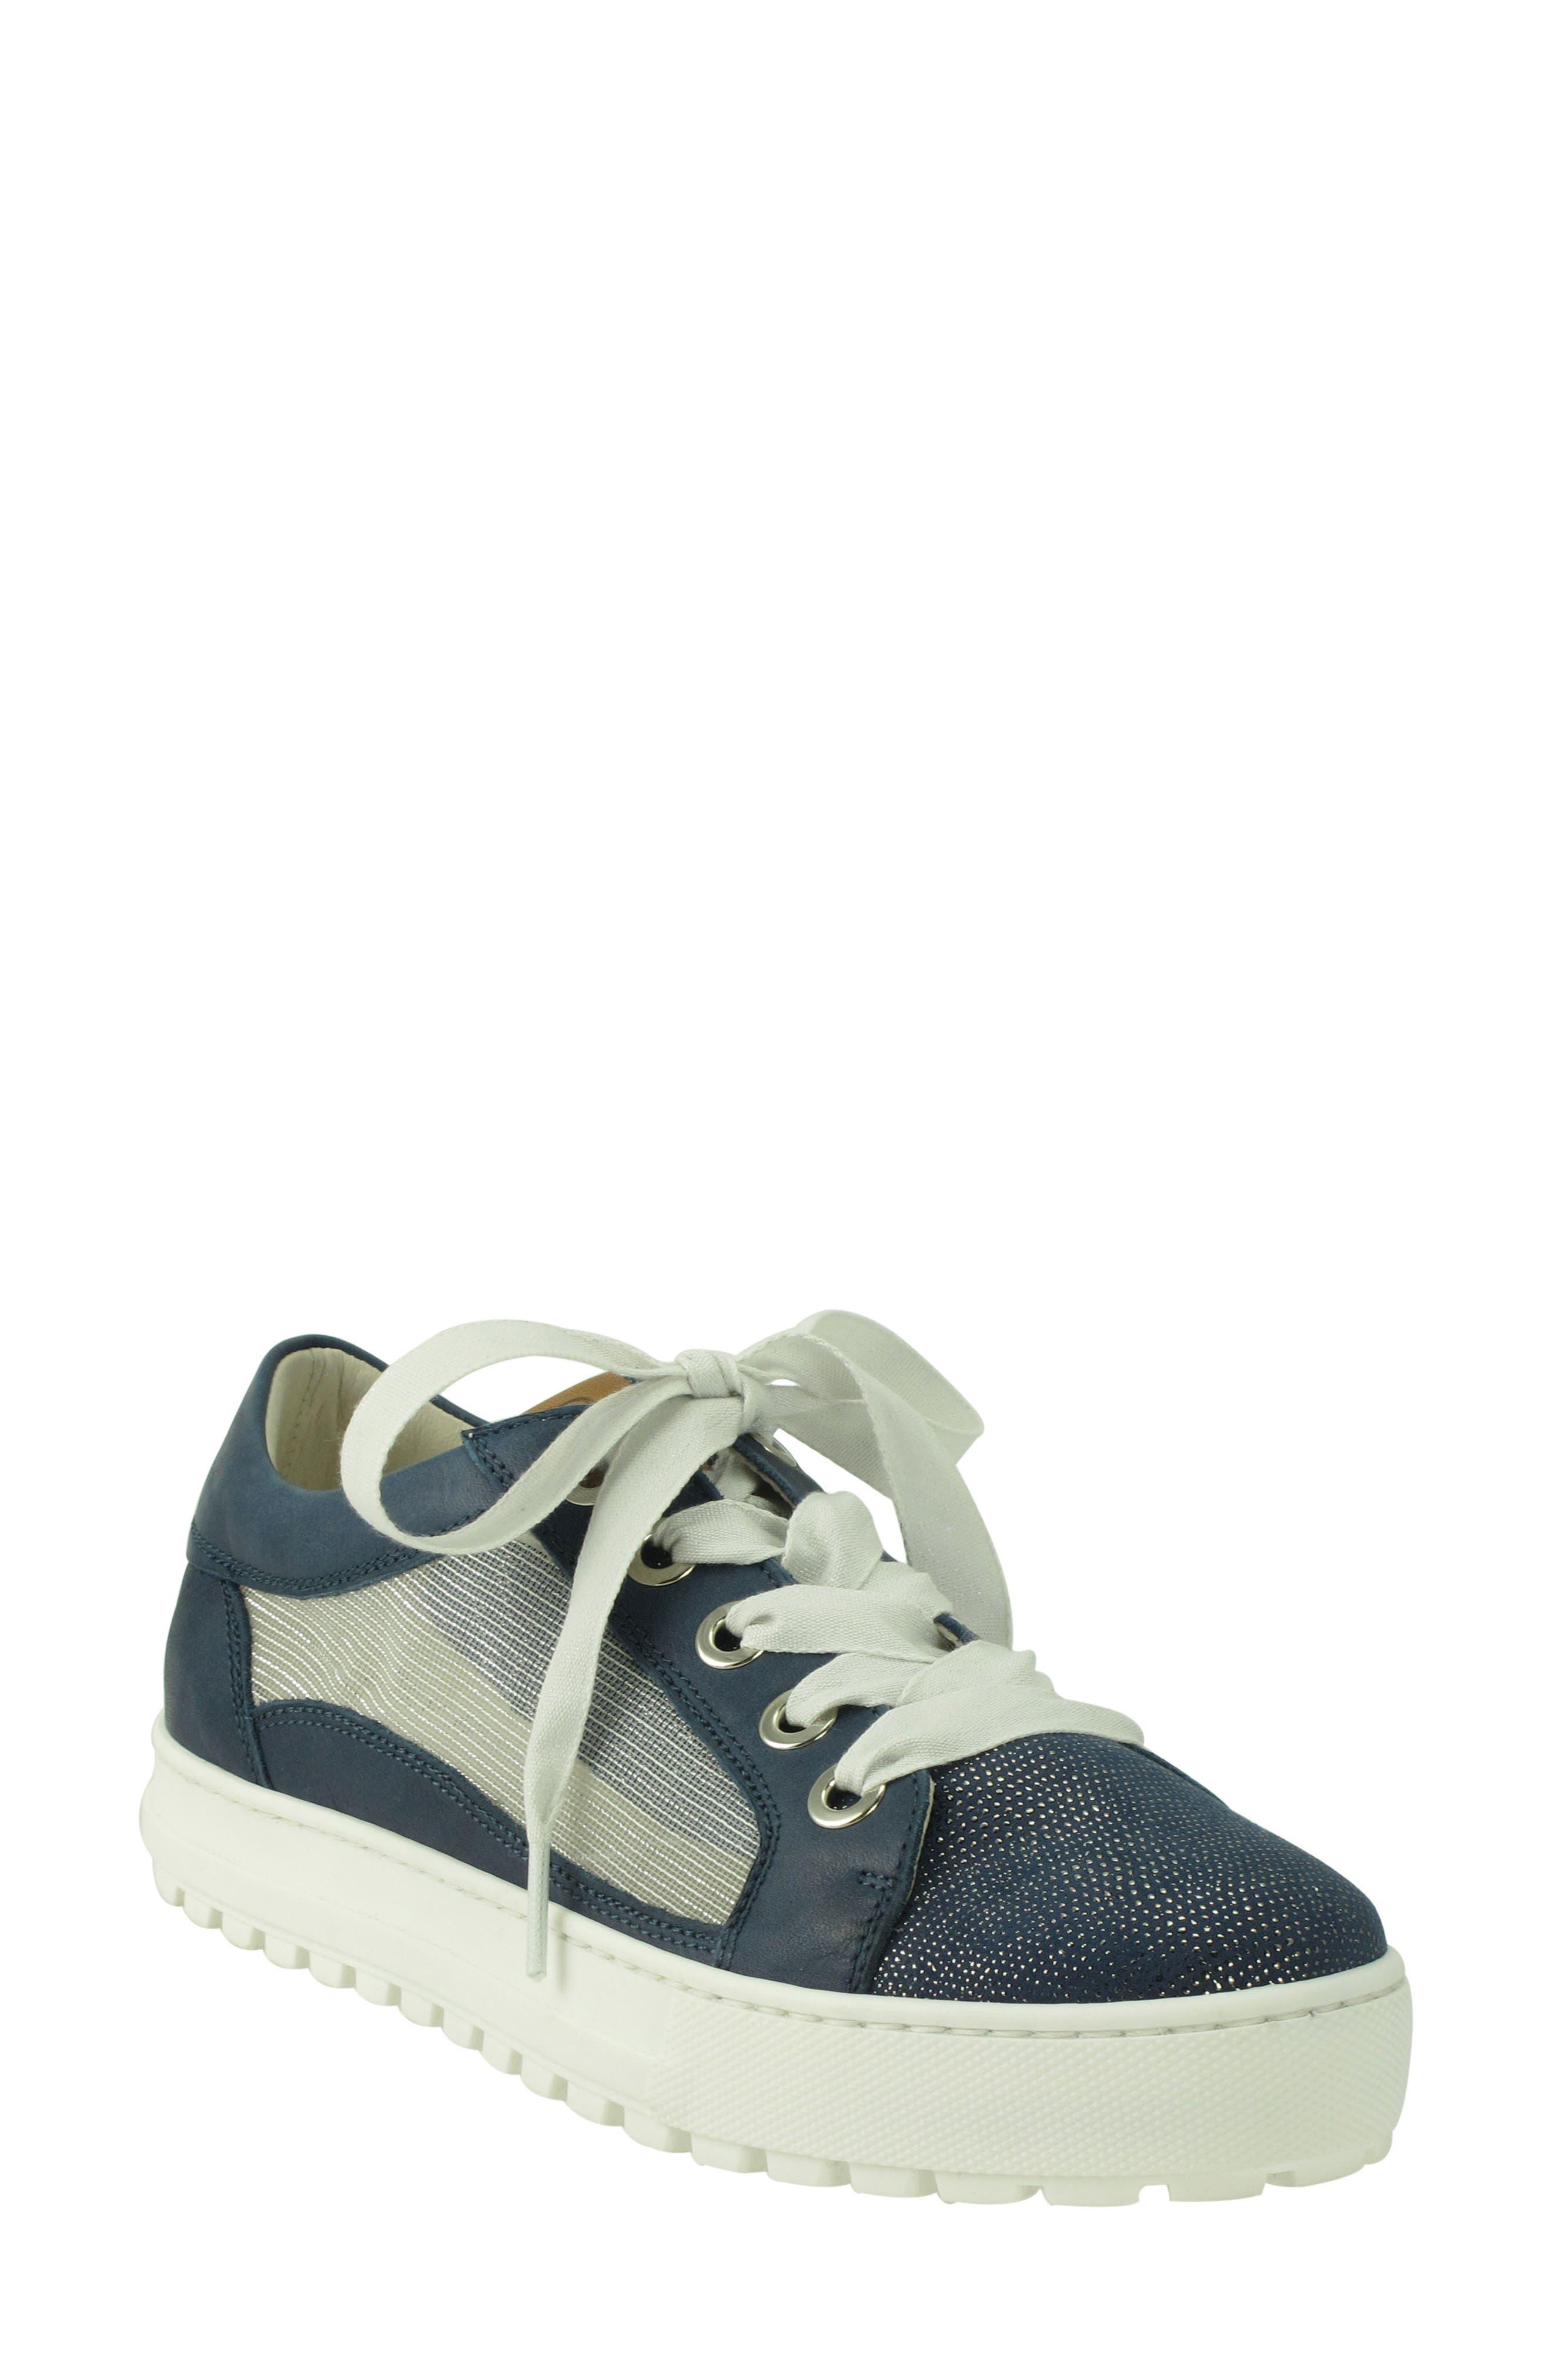 Layton Sneaker,                             Main thumbnail 1, color,                             400